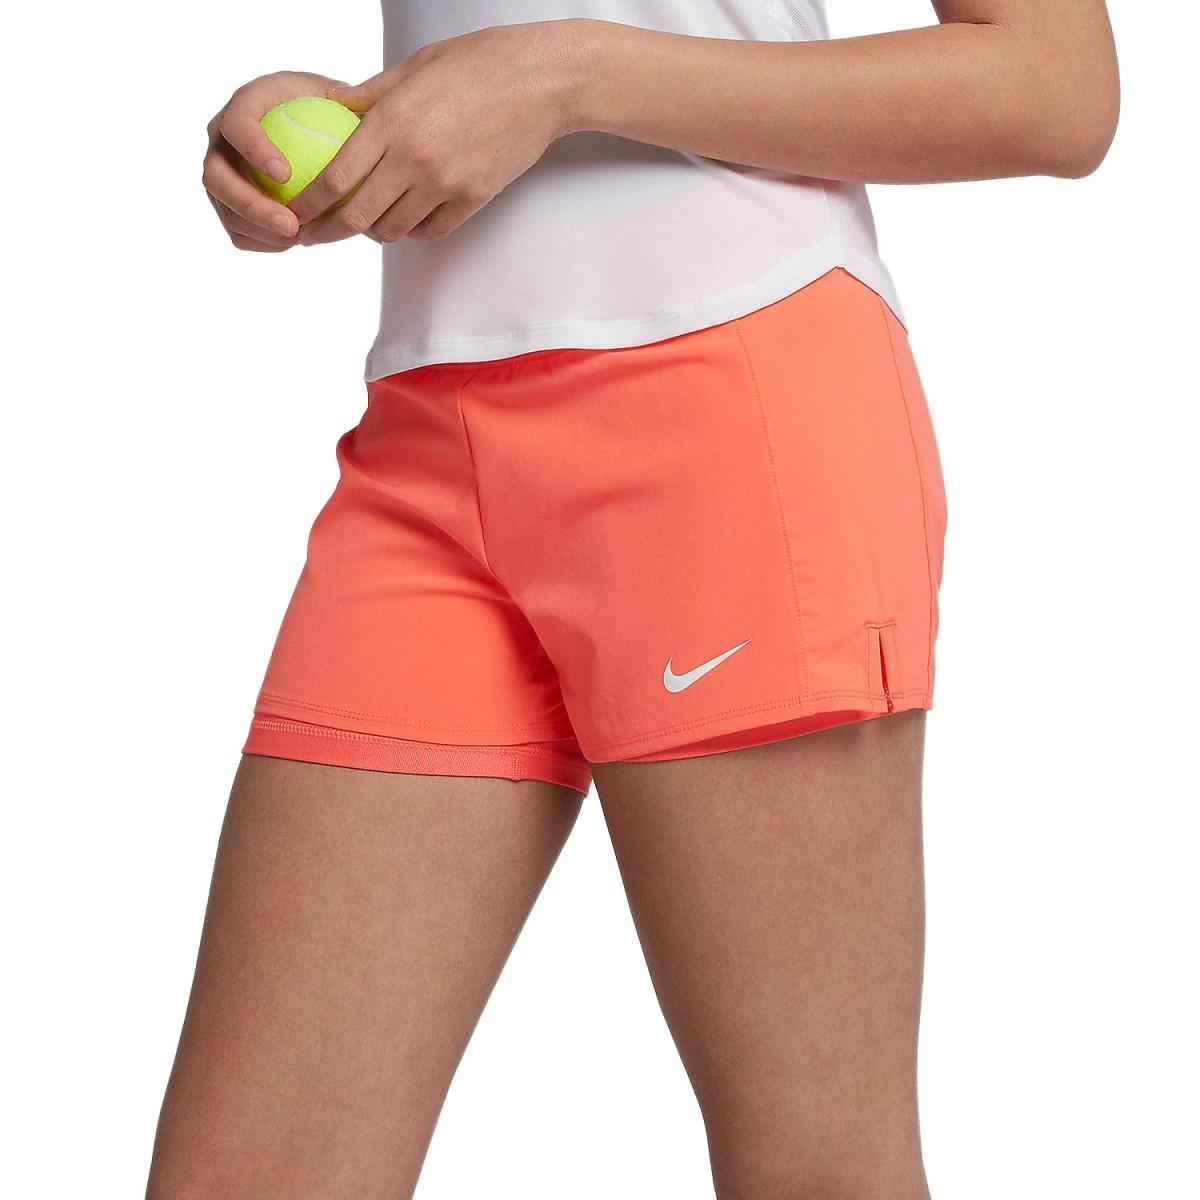 Тенісні шорти жіночі Nike Court FLX Pure Short wild mango/white